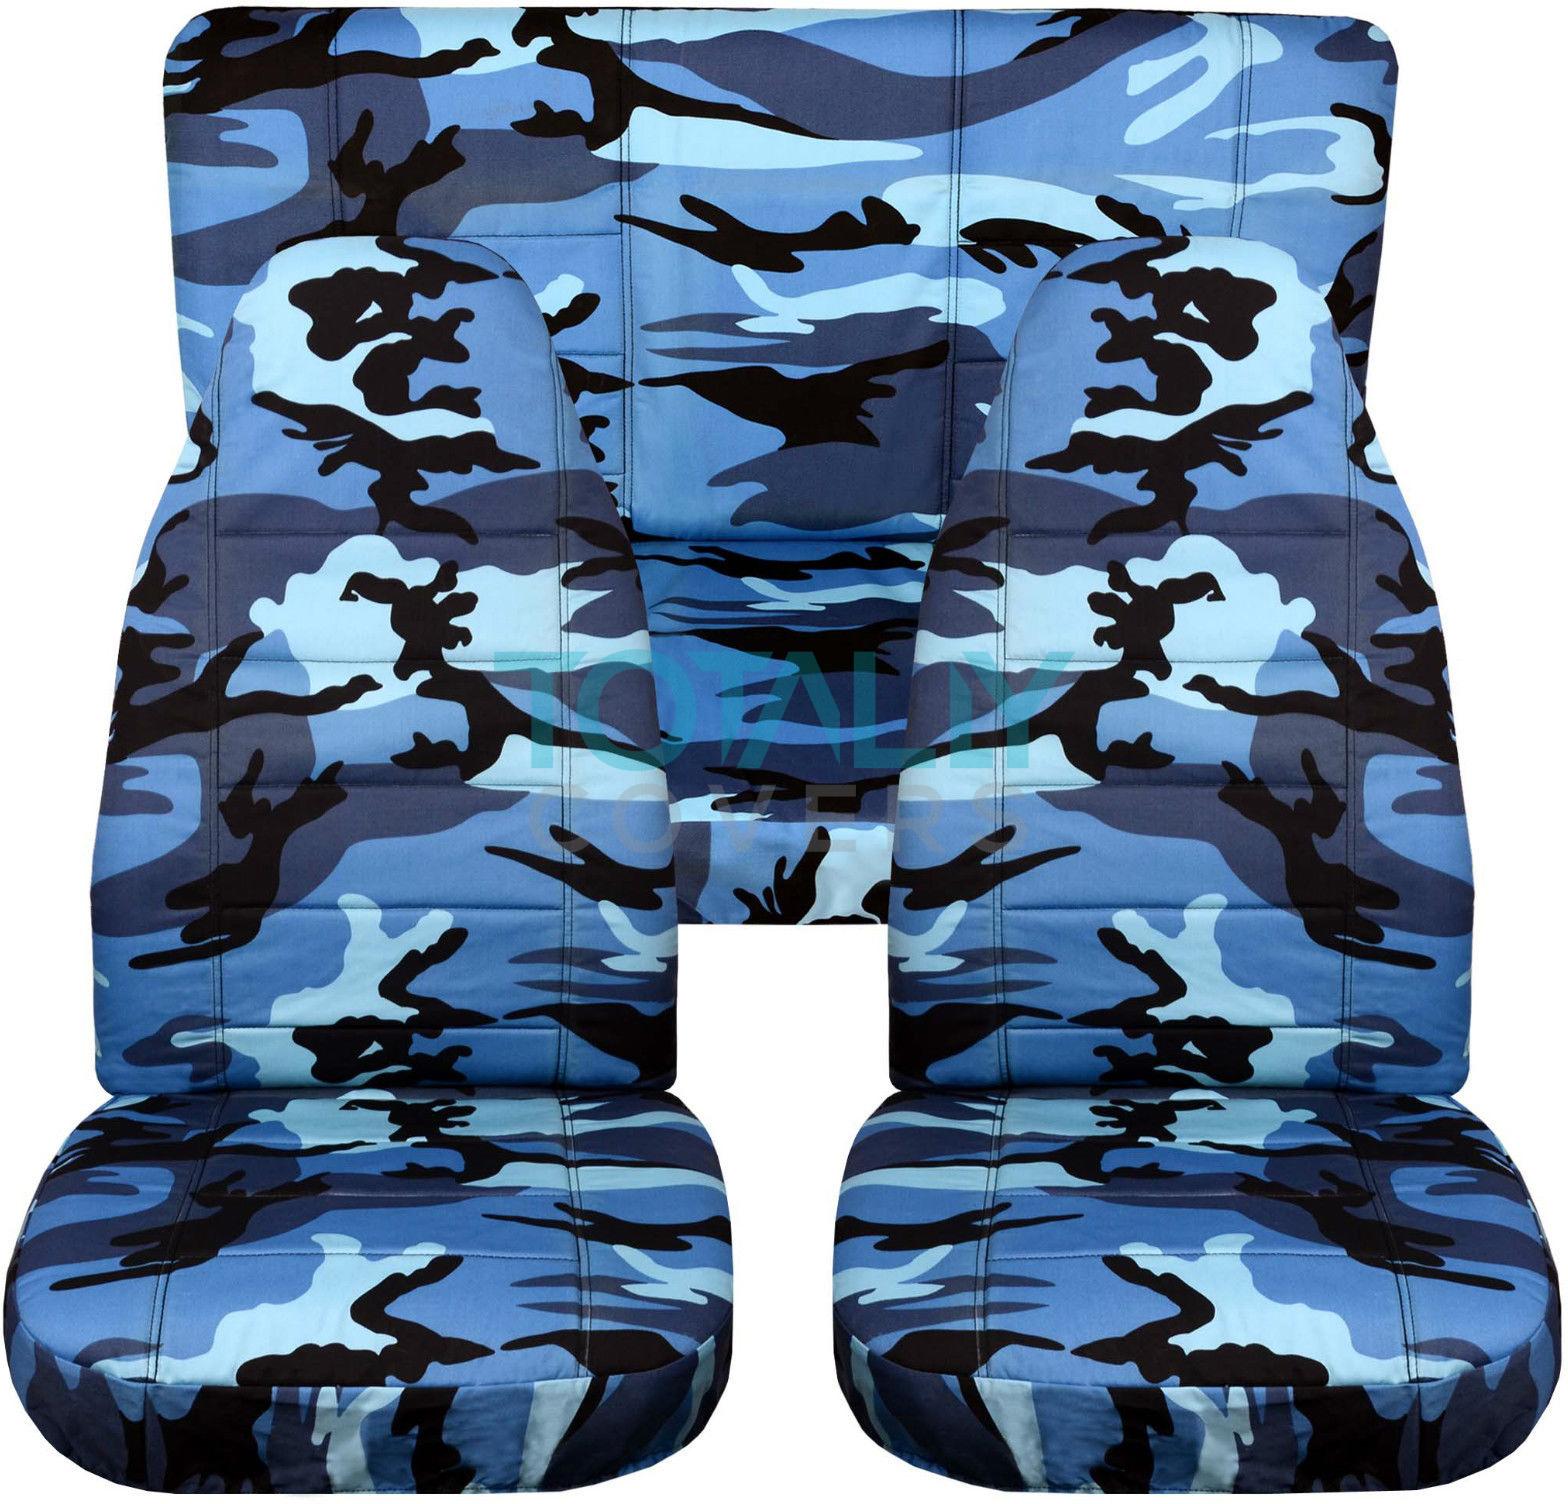 Blue Realtree Camo Seat Covers